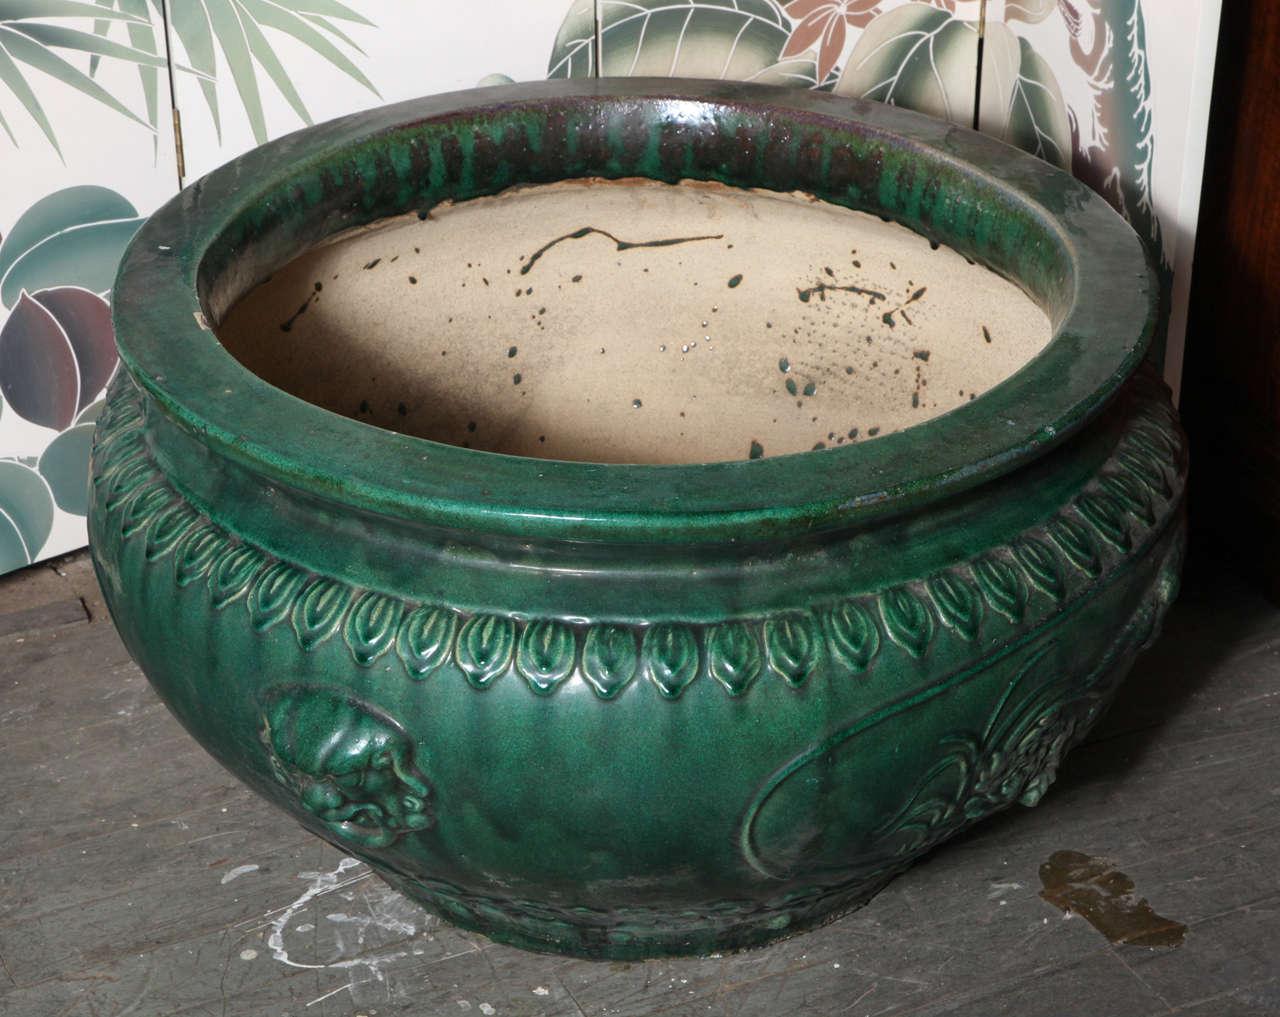 Antique Large Glazed Ceramic Planters, Hunan Province 3 - Antique Large Glazed Ceramic Planters, Hunan Province At 1stdibs